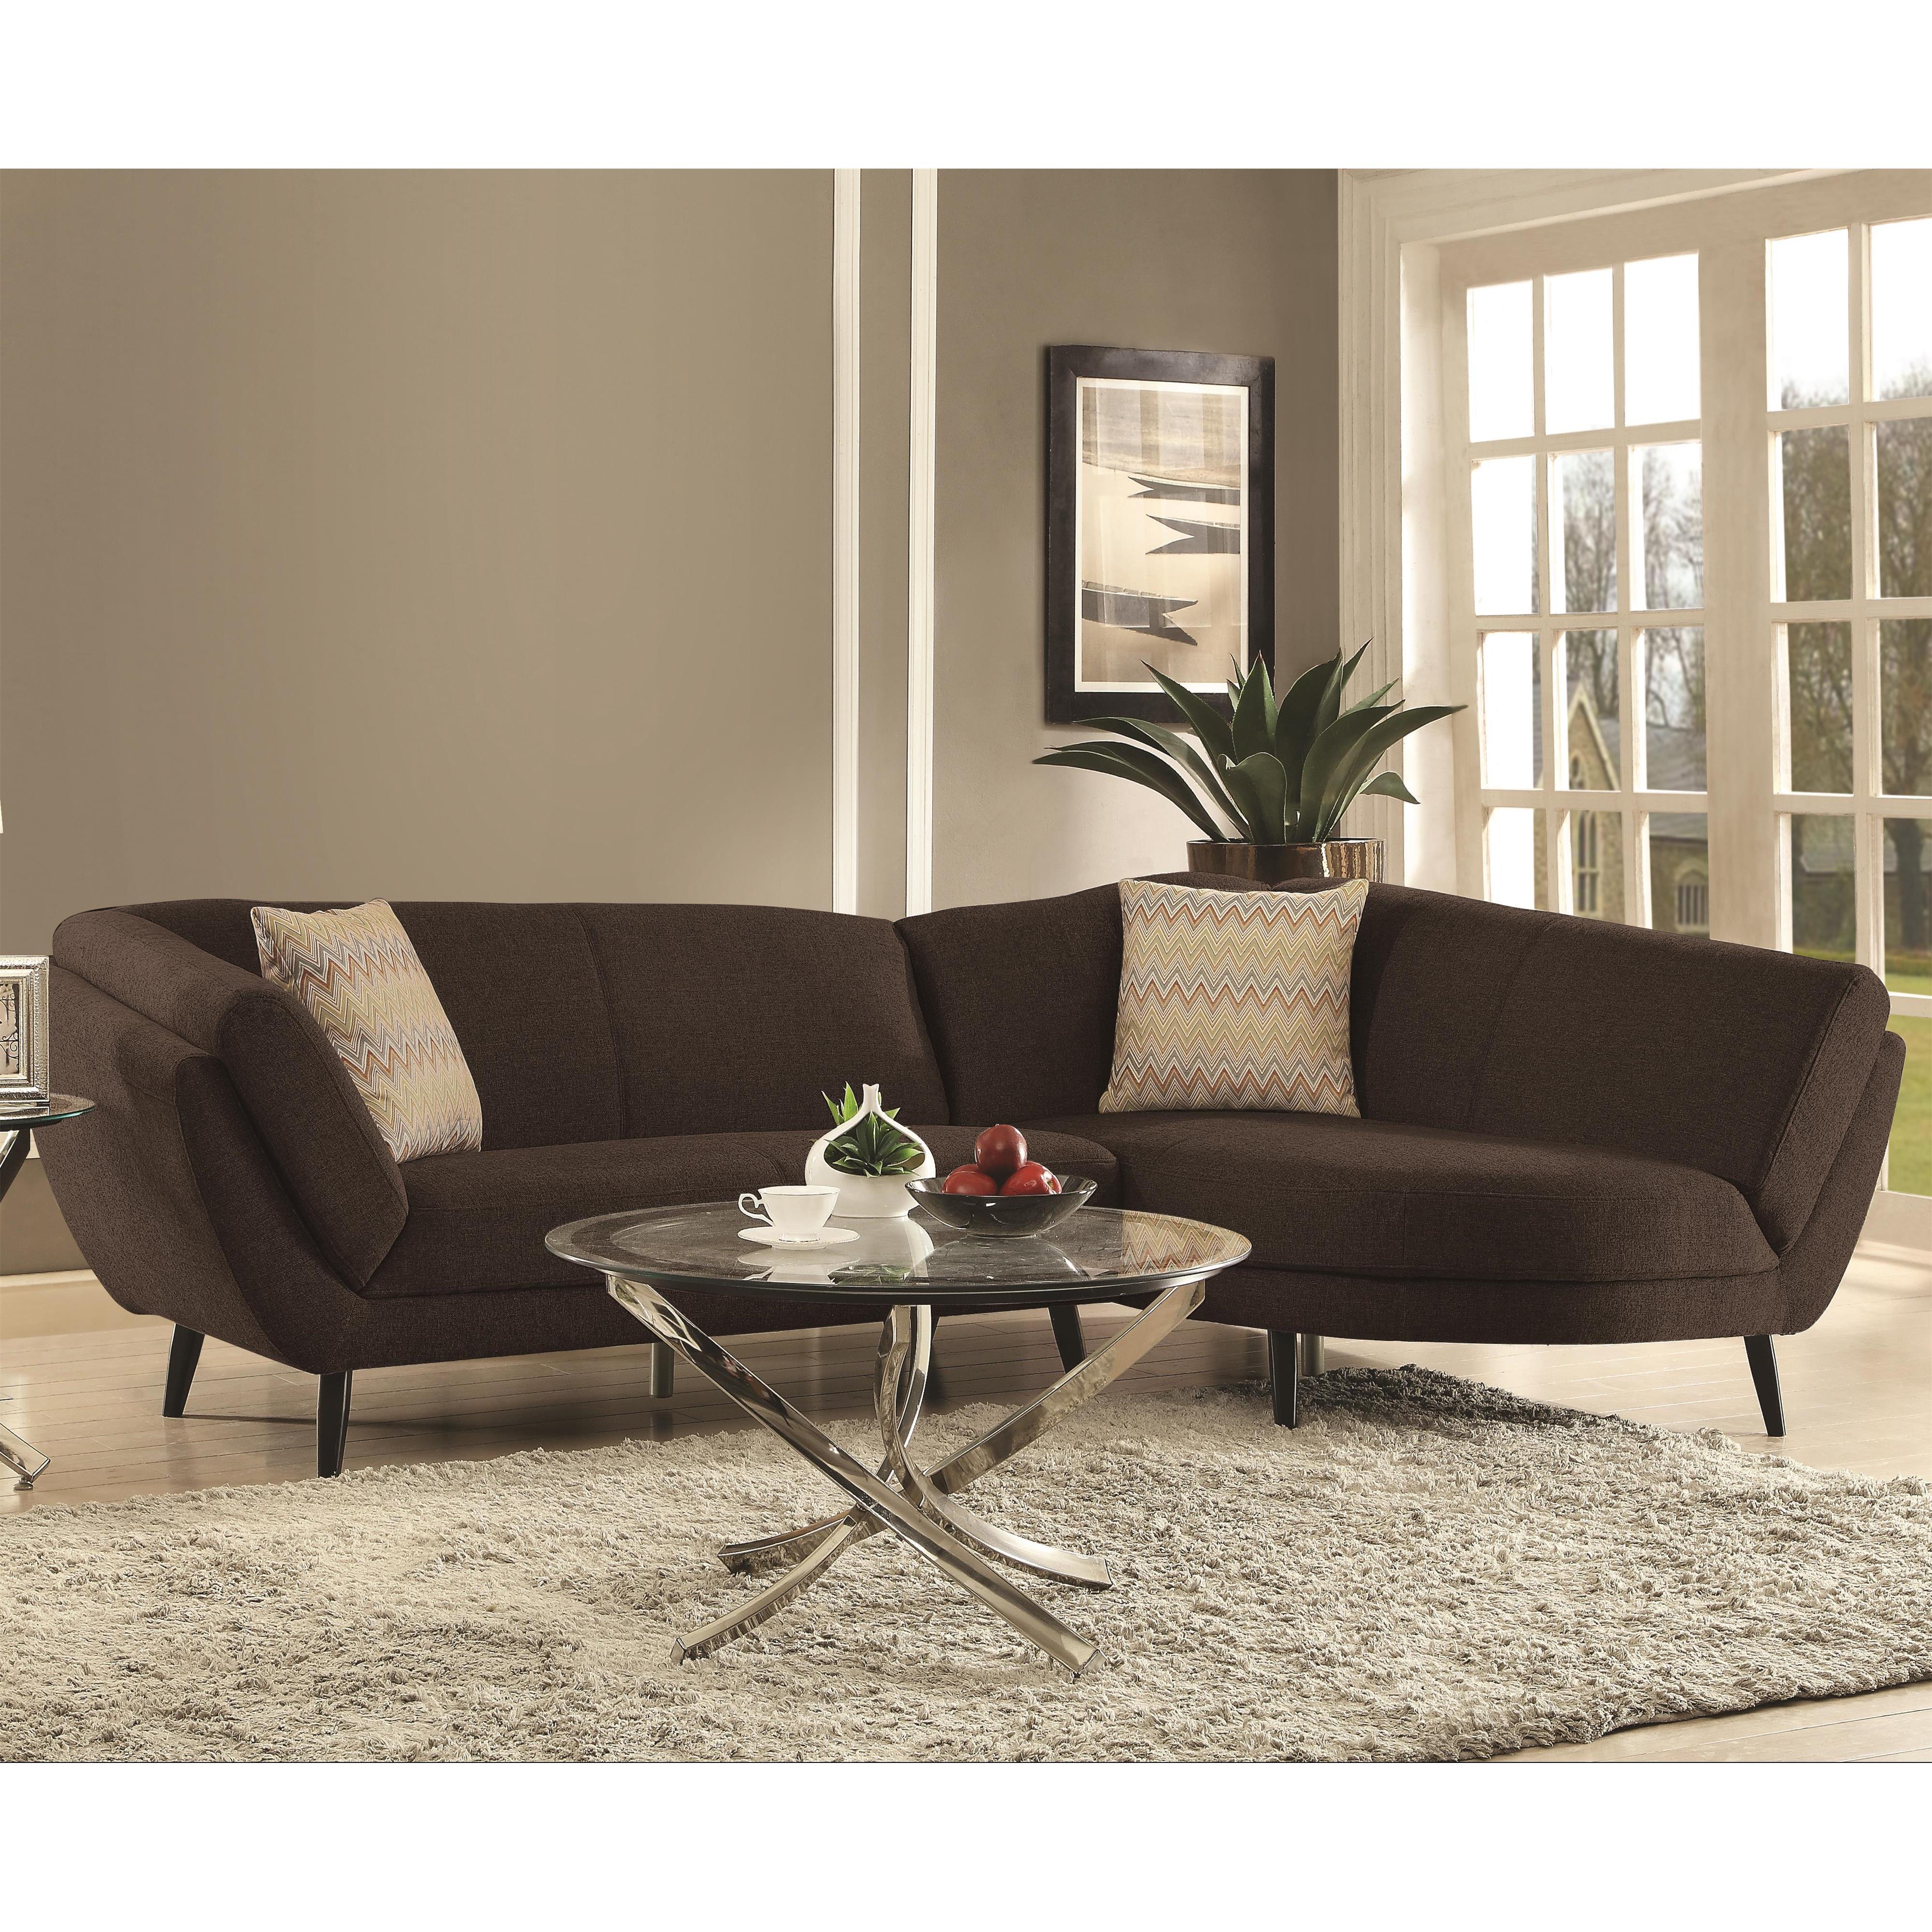 Coaster Norwood Sectional Sofa - Item Number: 500463